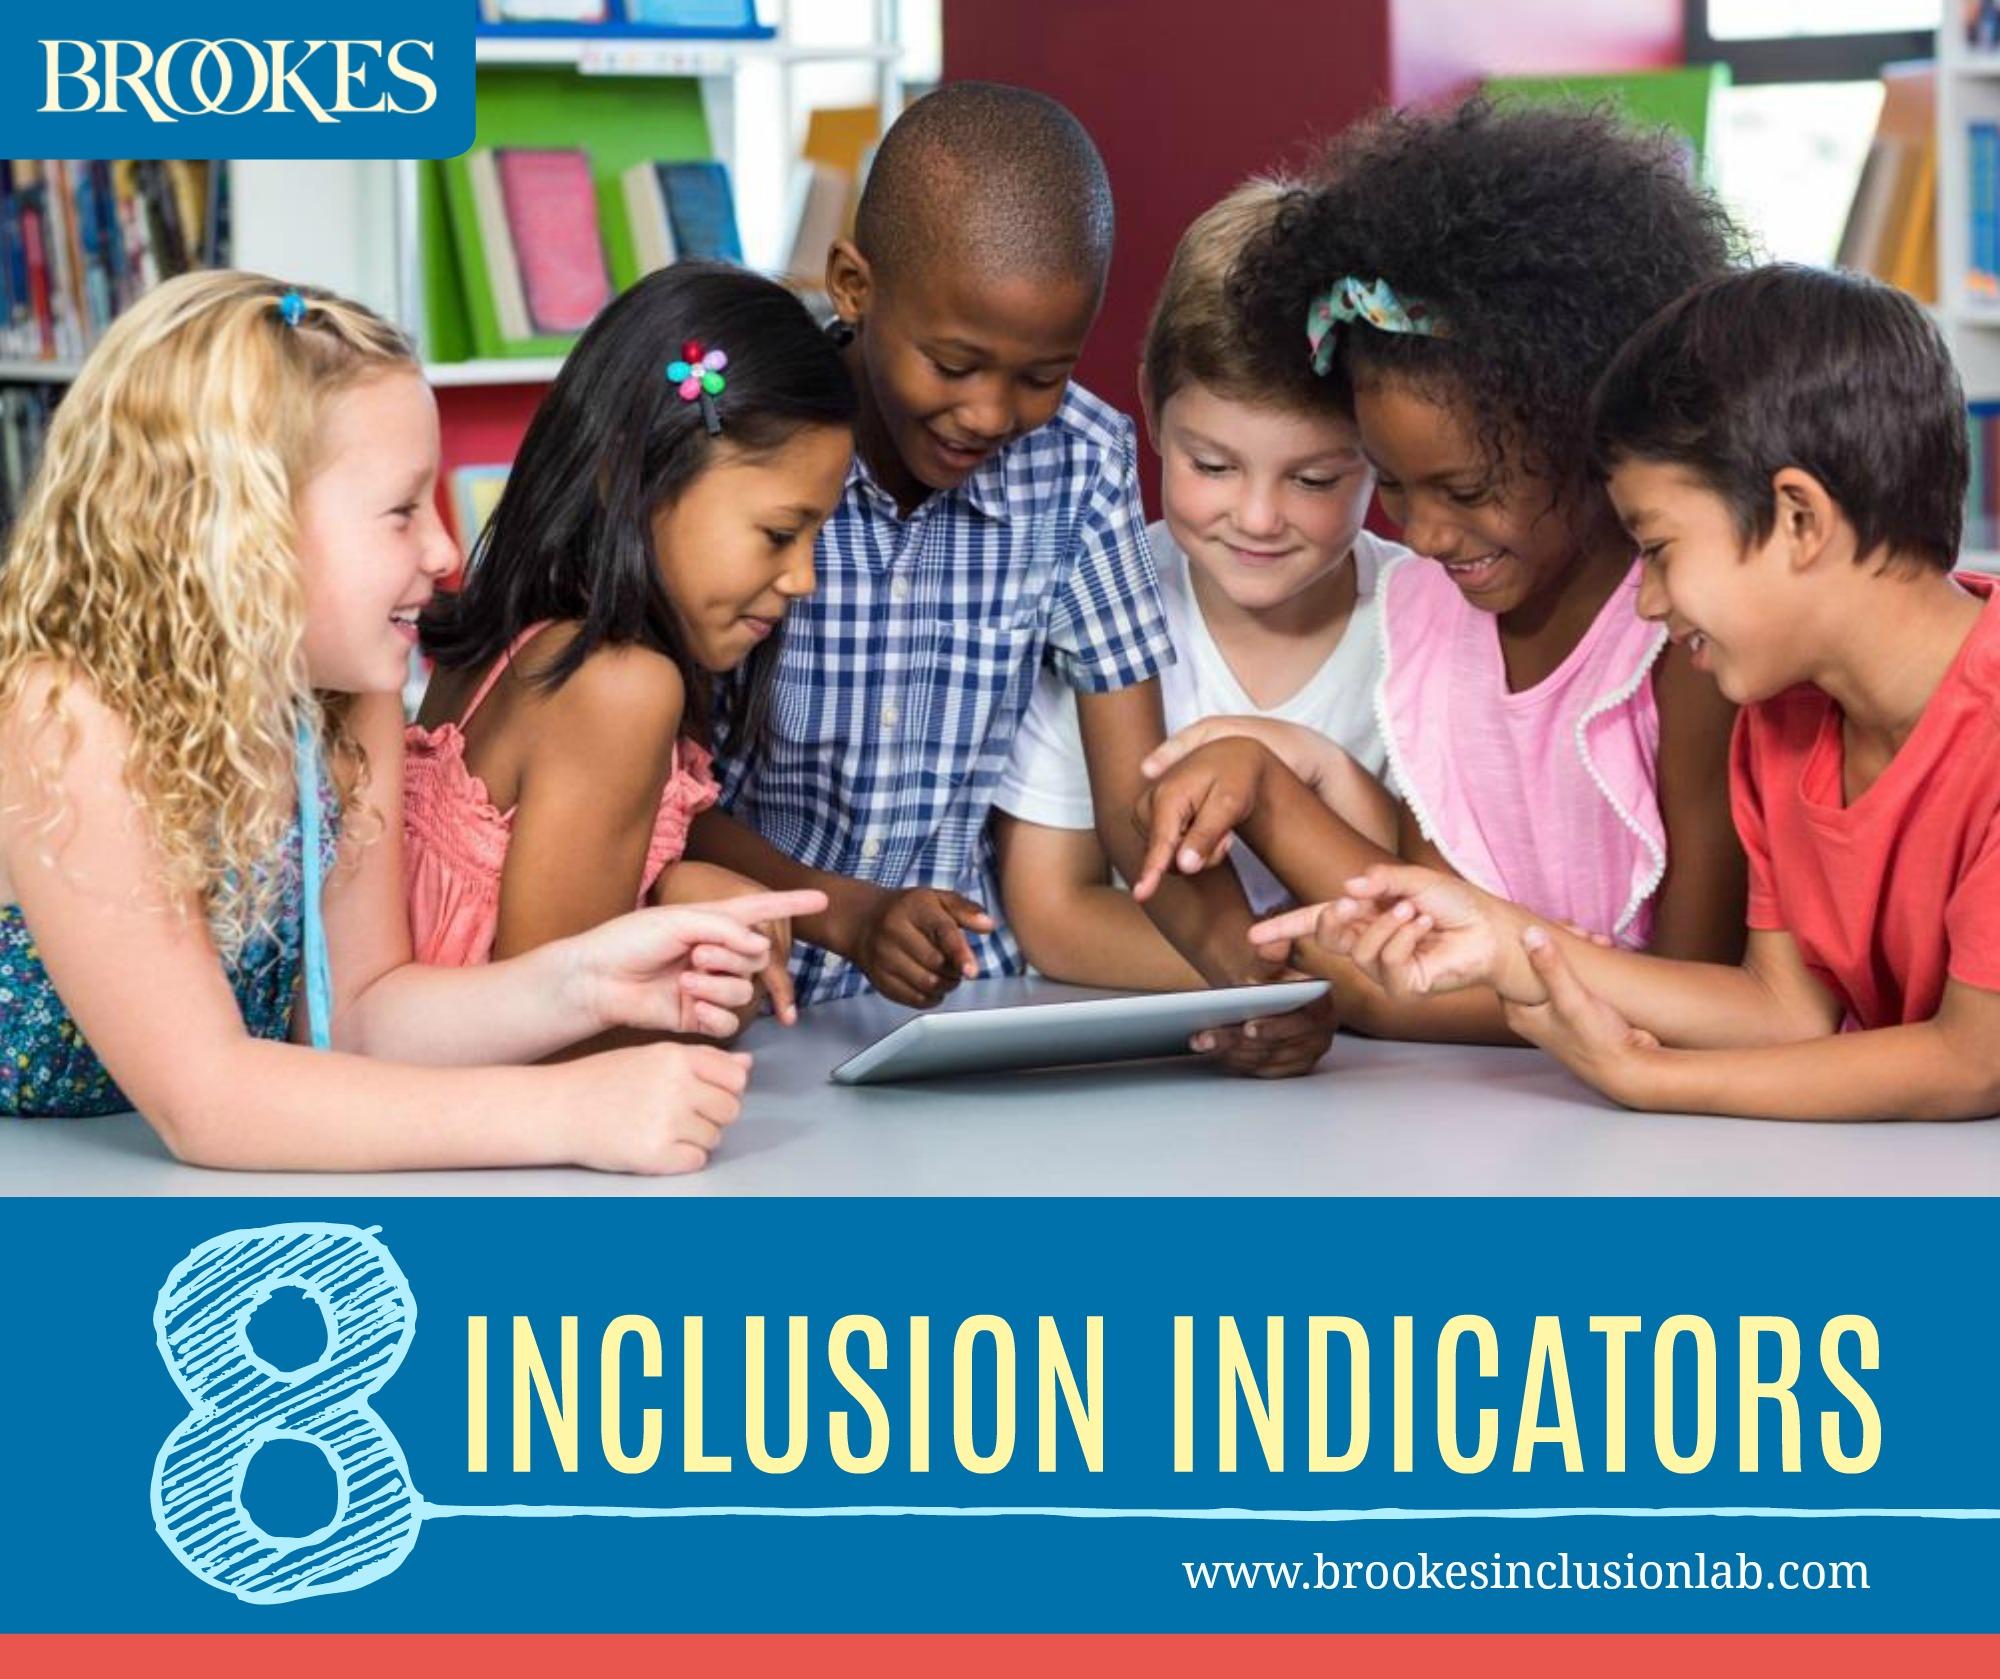 binary options strategy key indicators of inclusive education